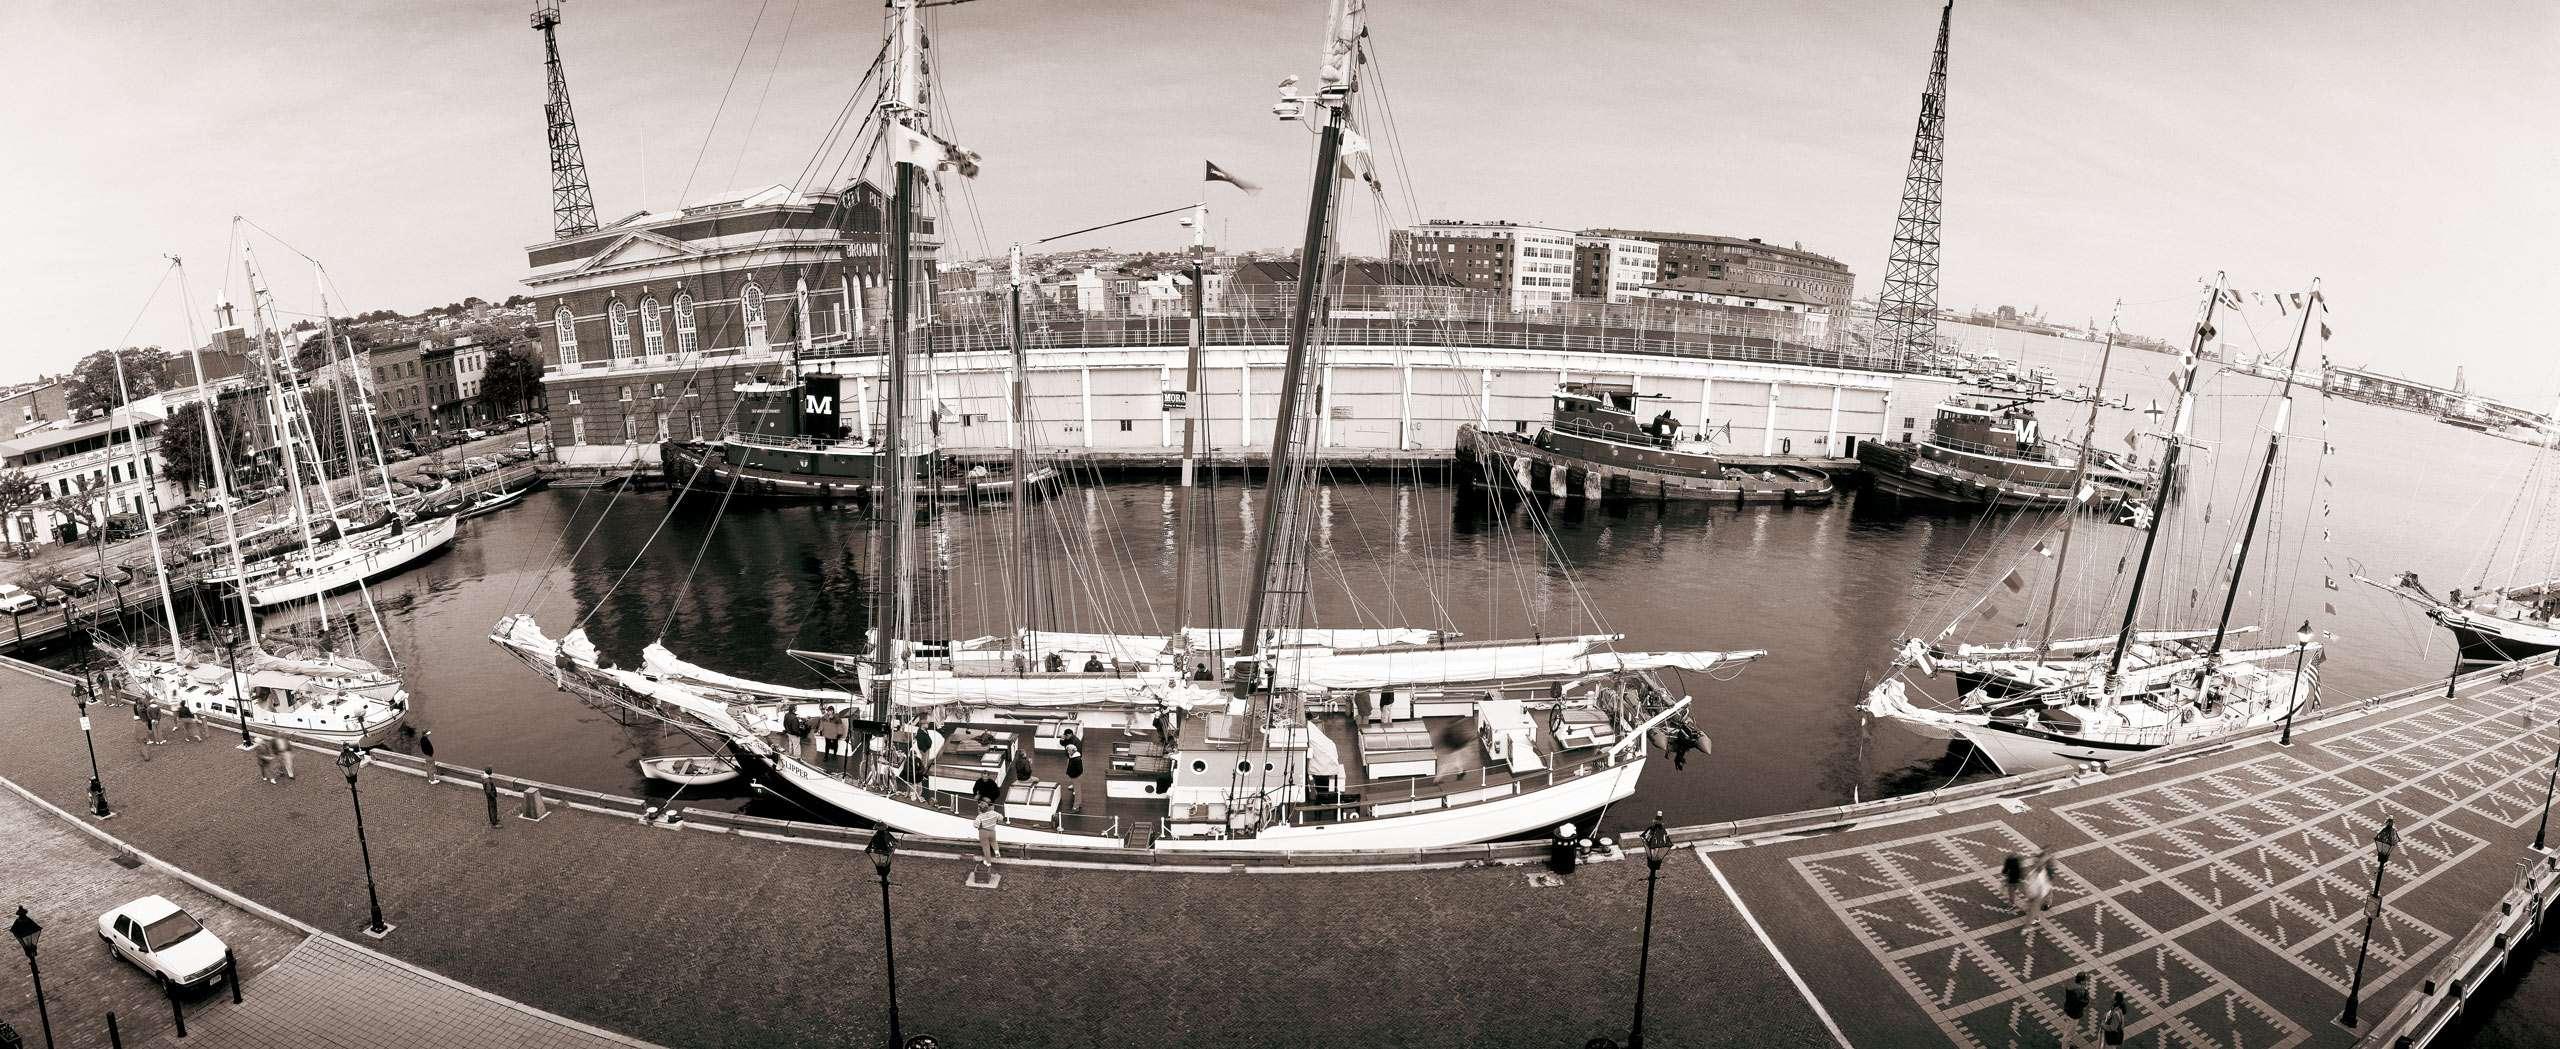 PORTFOLIO - Baltimore - Neighborhoods    #23   Fells Point with schooners and tugboats docked.